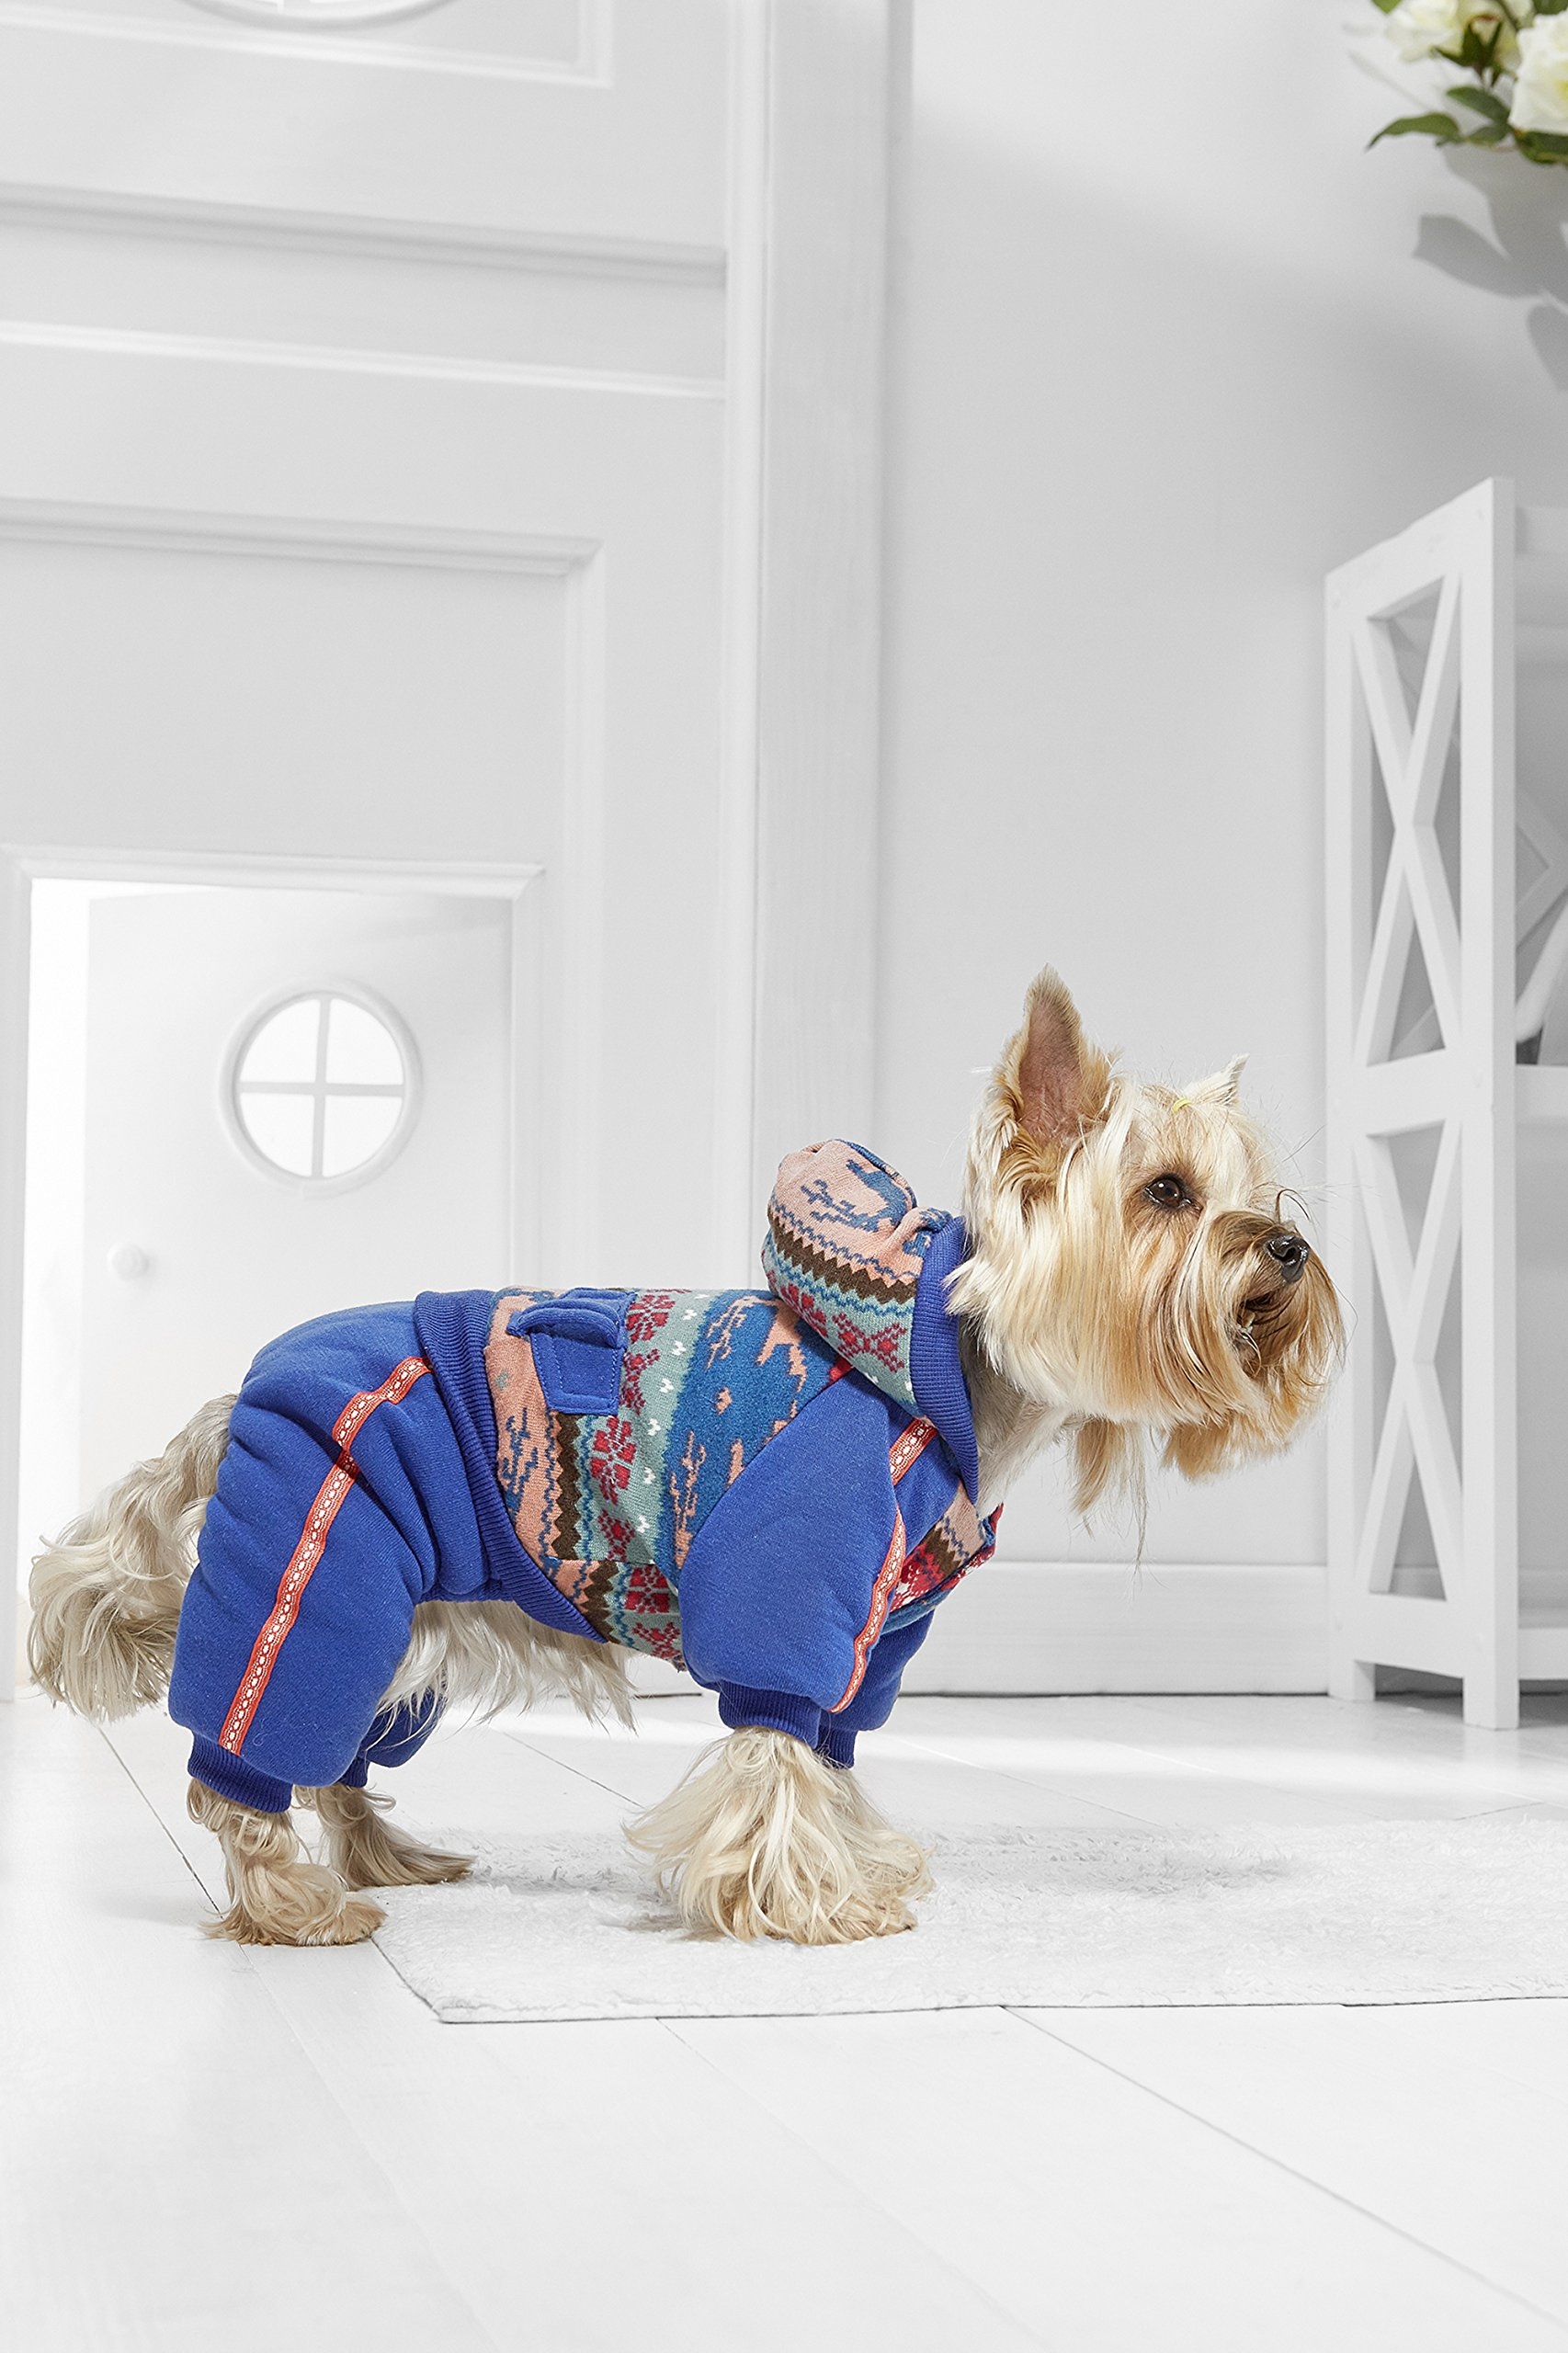 Toy Dog Winter Jumpsuit For Yorkie Pom Chihuahua Papillon Mini Schnauzer Maltese (Tiny Size, blue, yellow, gray)